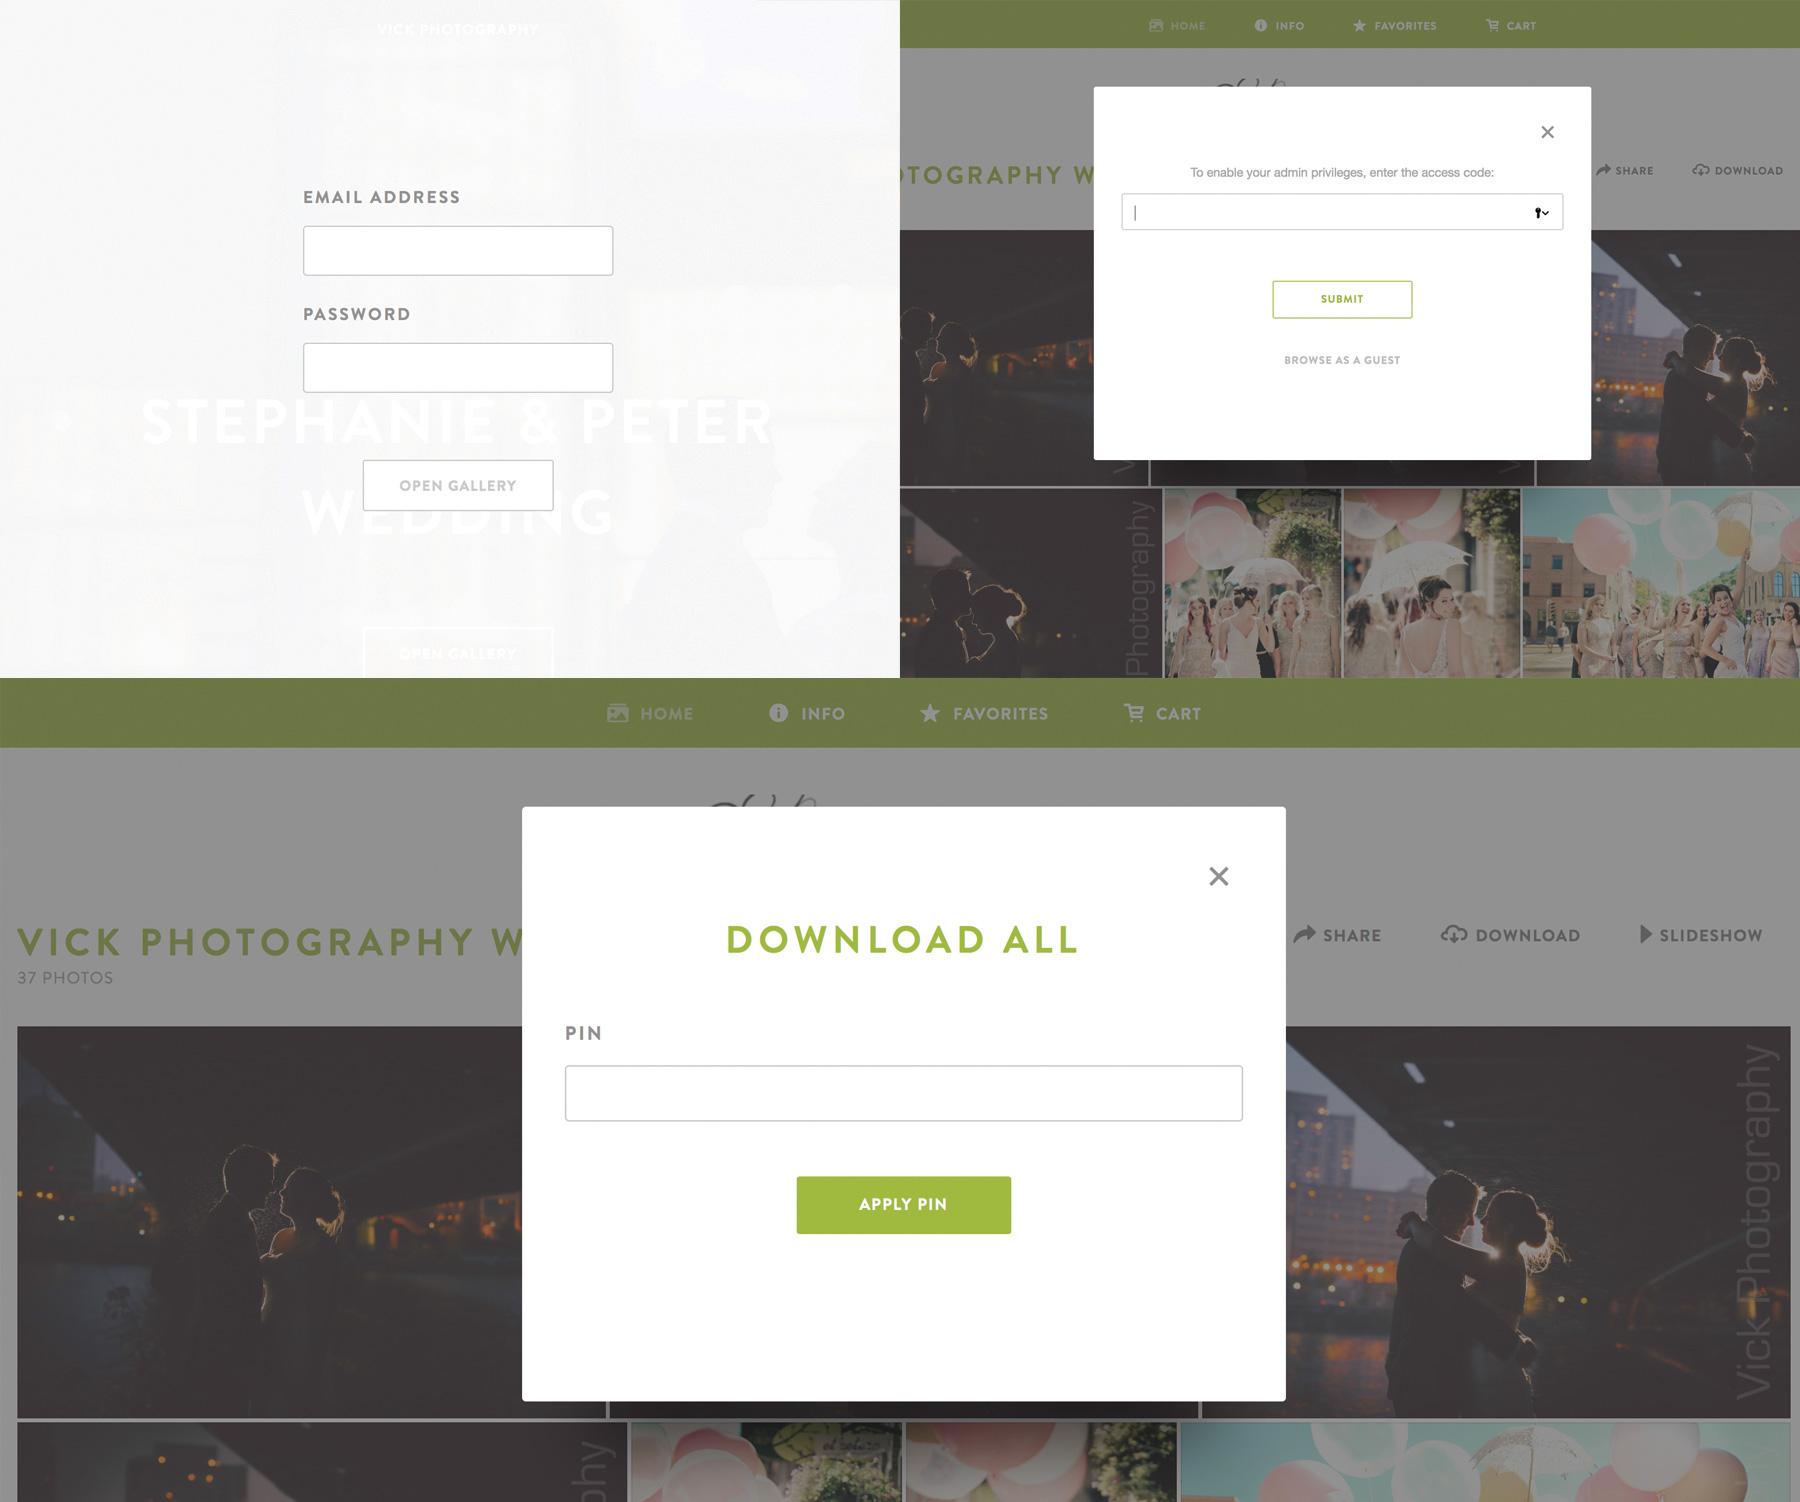 Download-Steps.jpg